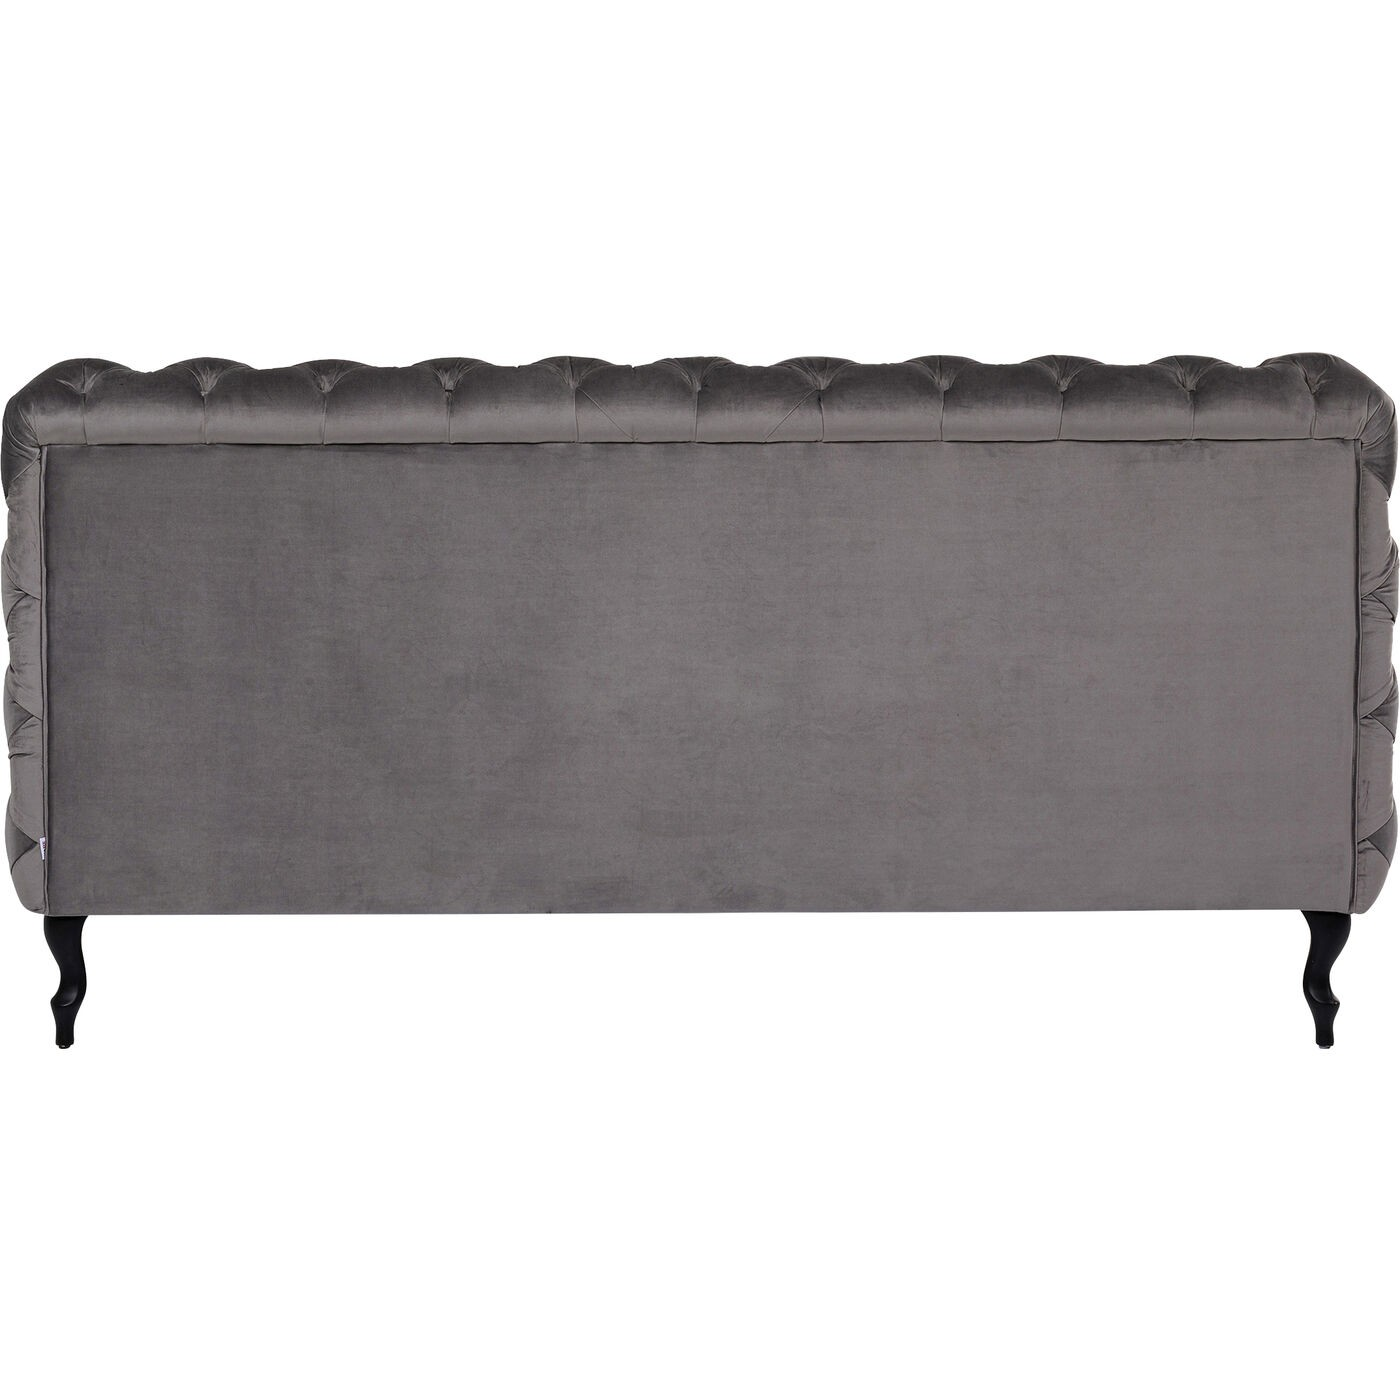 Lit Desire gris Kare Design Taille - 160x200cm